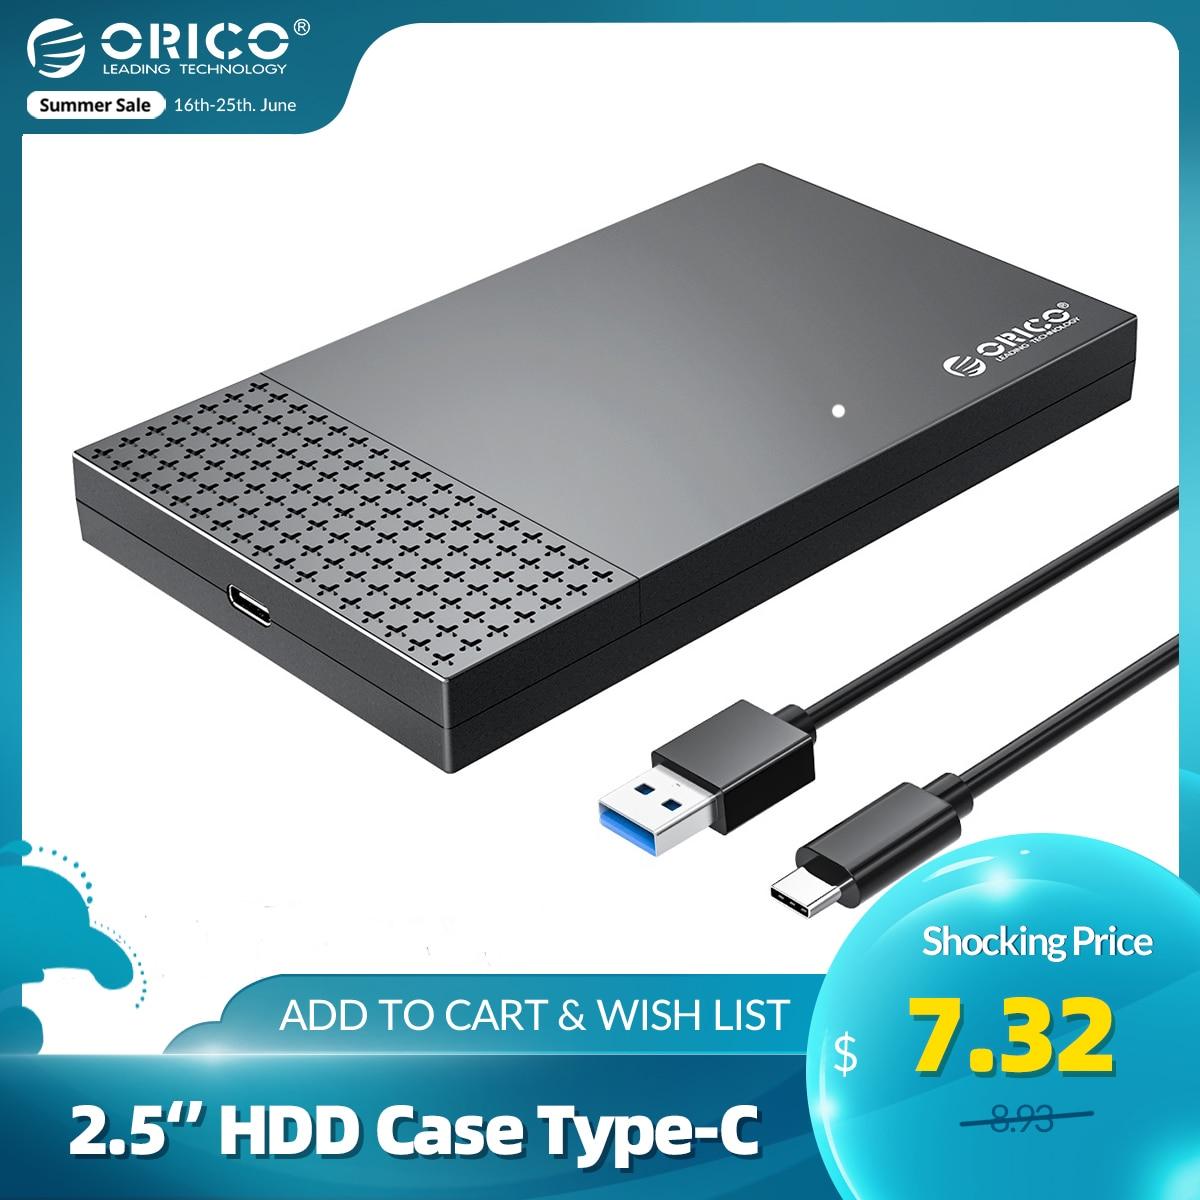 ORICO HDD Case Type-C SATA to USB 3.0 2.5